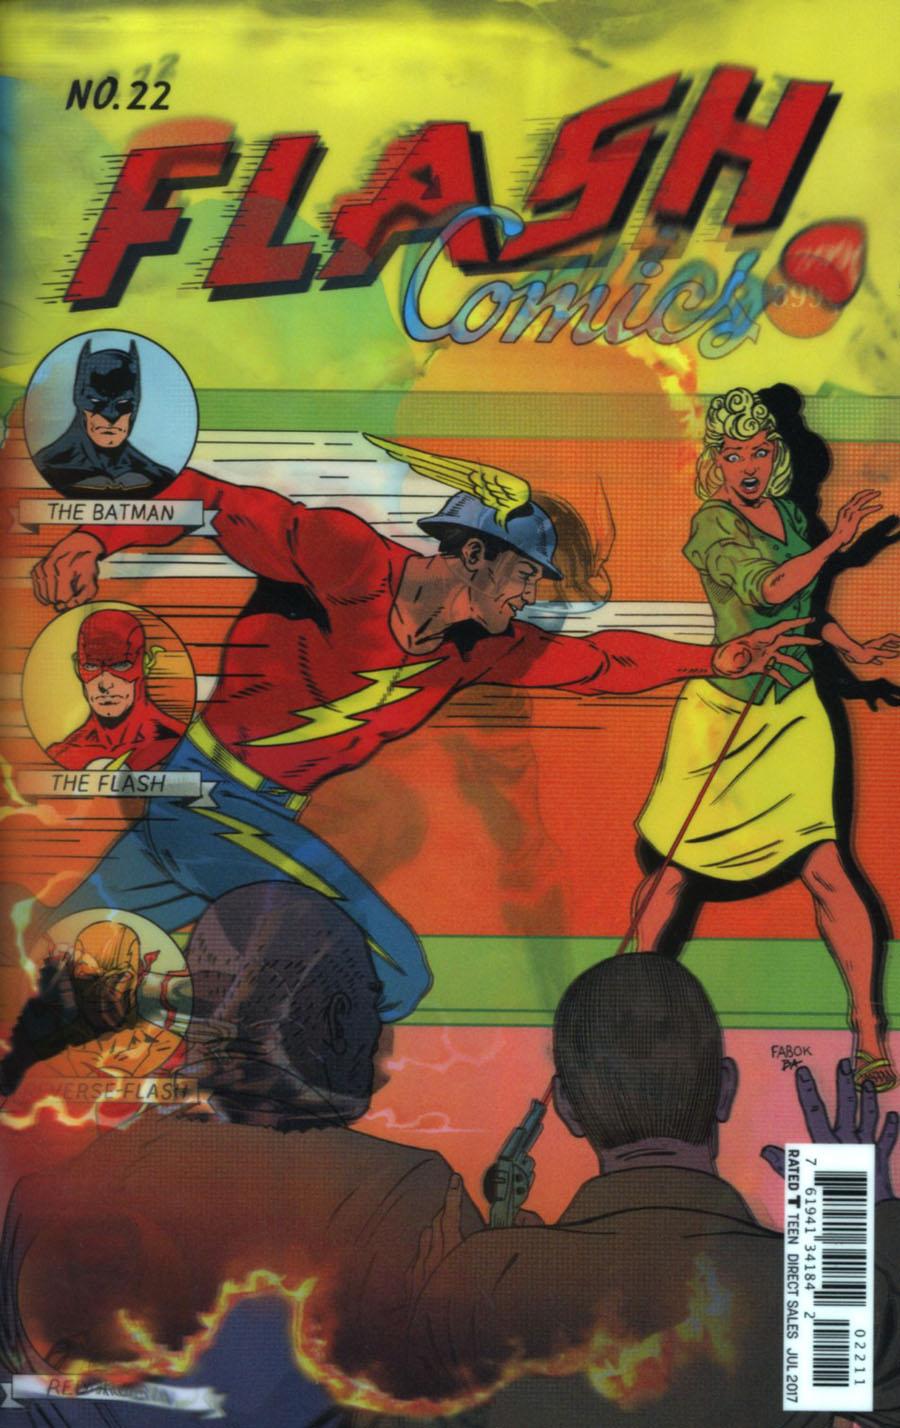 Flash Vol 5 #22 Cover A Regular Jason Fabok Lenticular Cover (The Button Part 4)